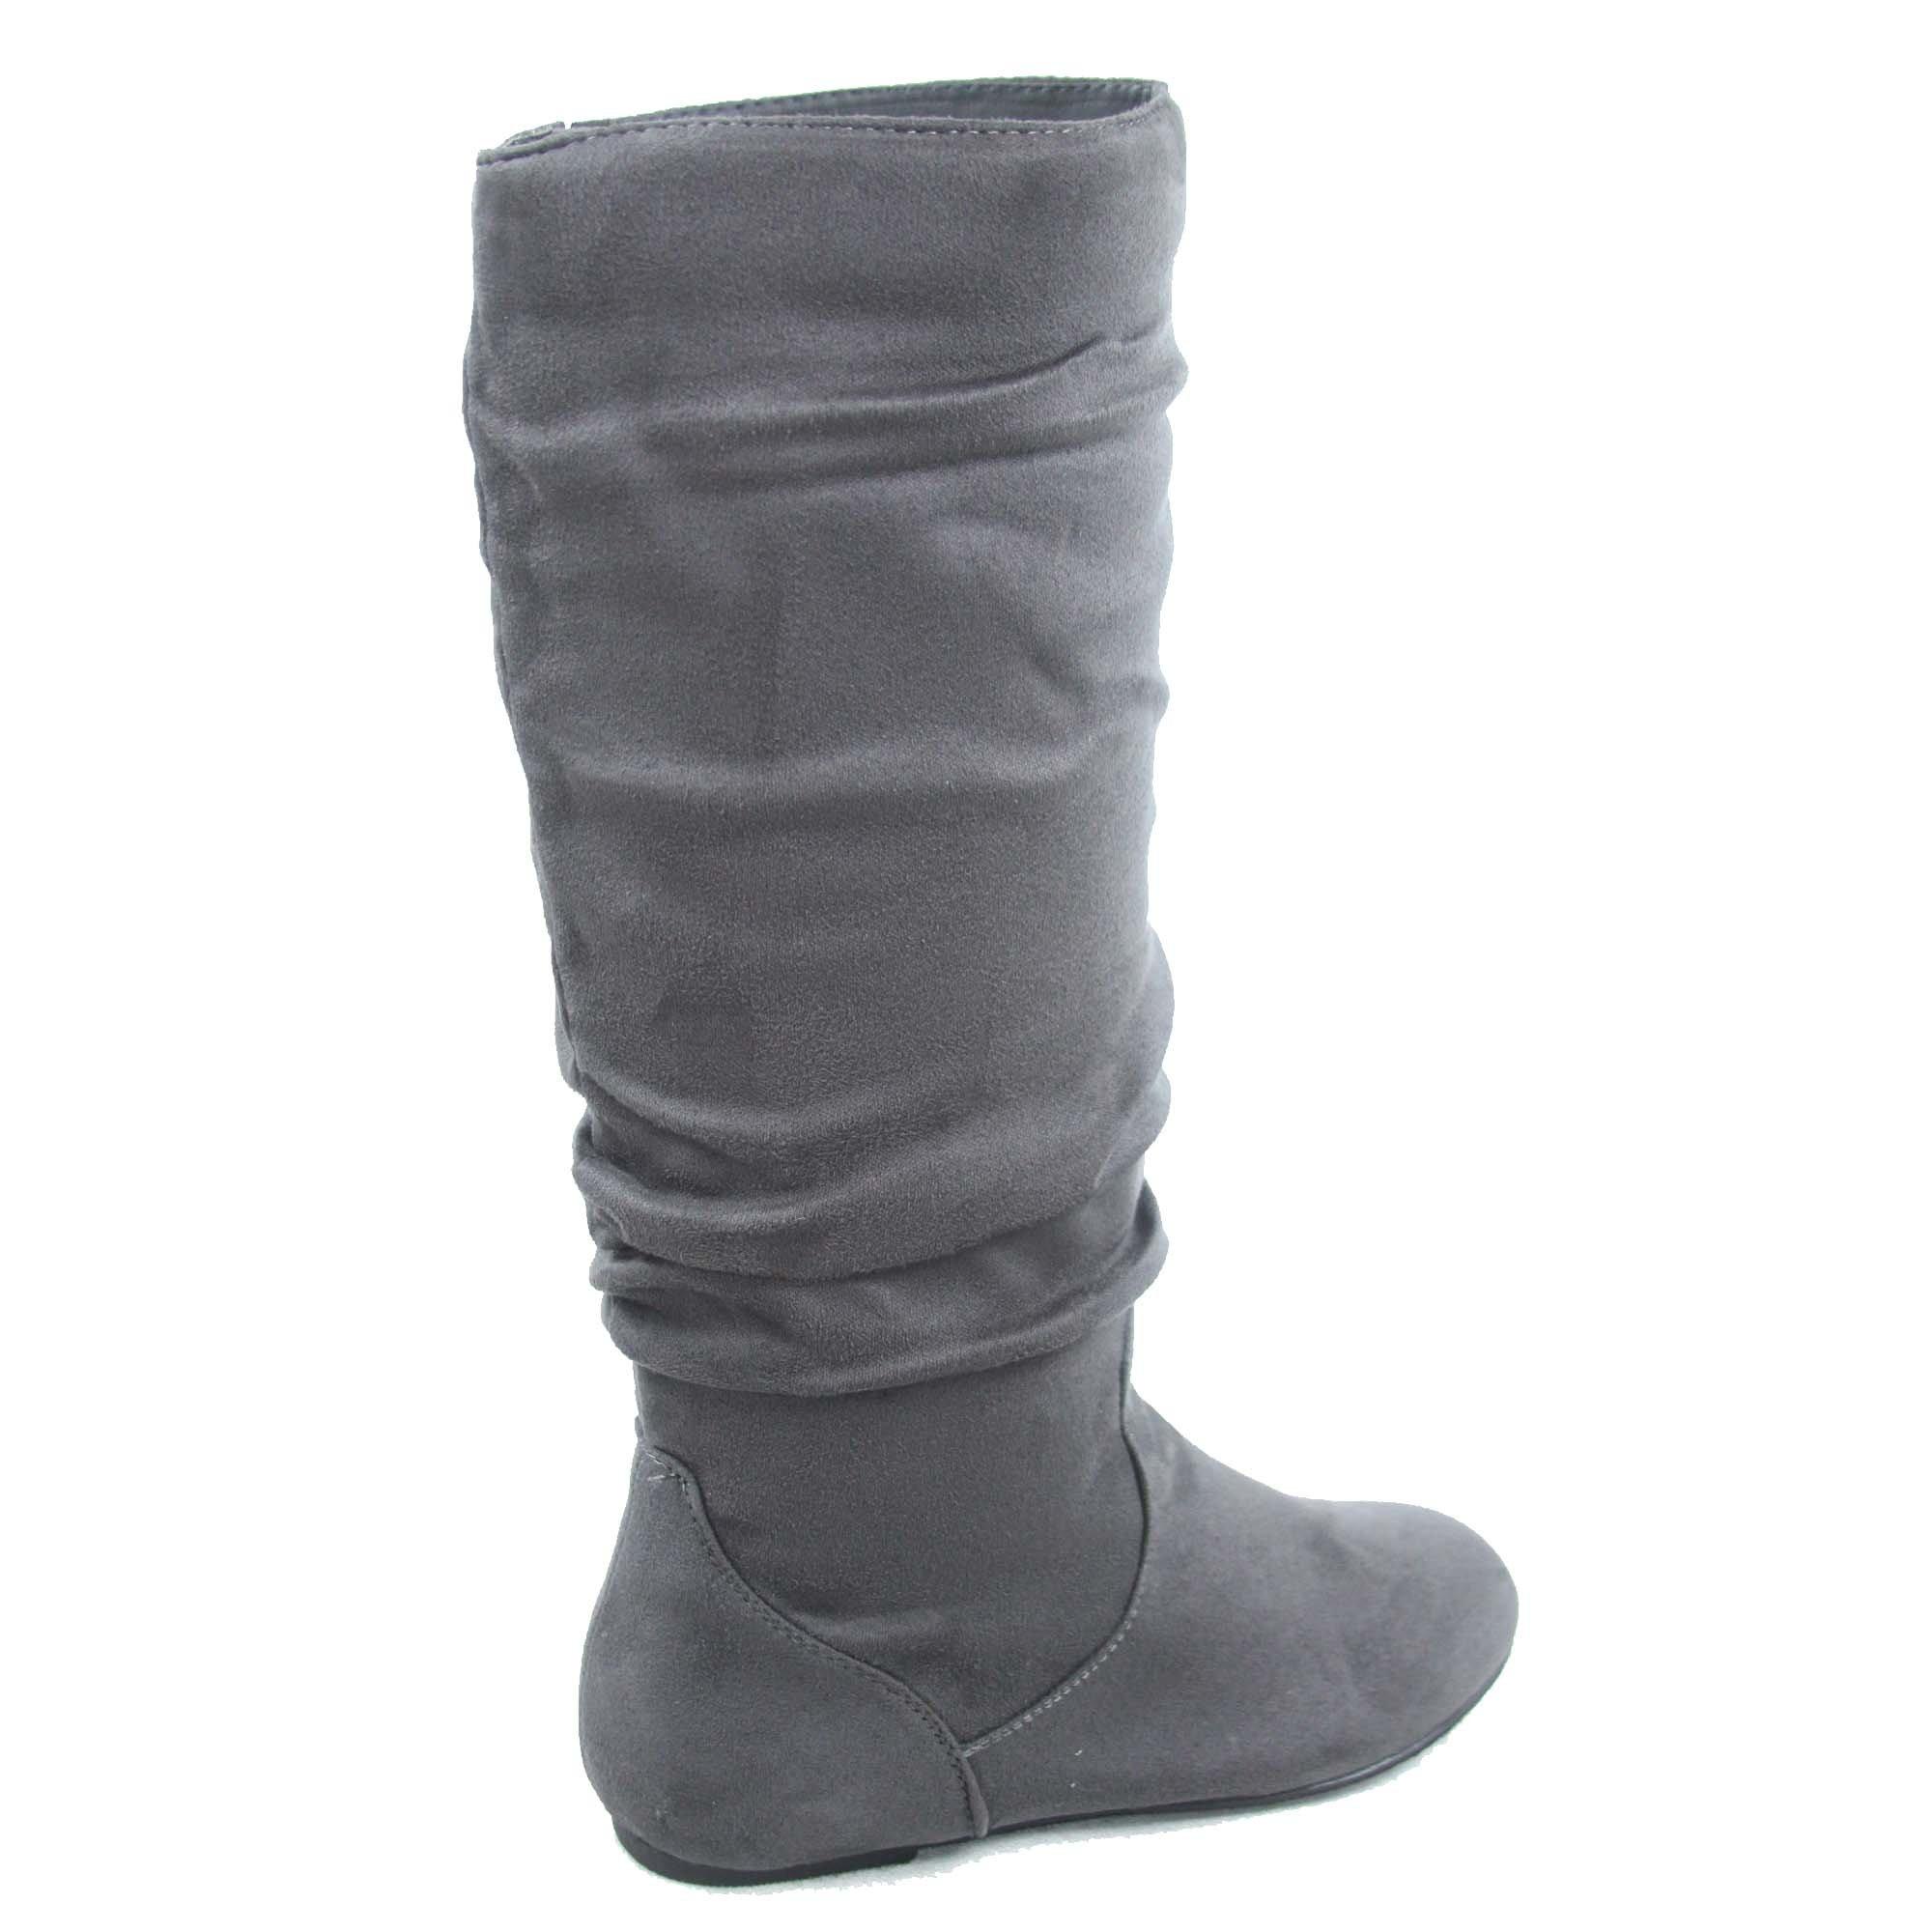 Top Moda Data-1 Women's Shoes Cute & Comfort Round Toe Flat Heel Slouchy Mid Calf Boot (7, Grey) by Top Moda (Image #3)